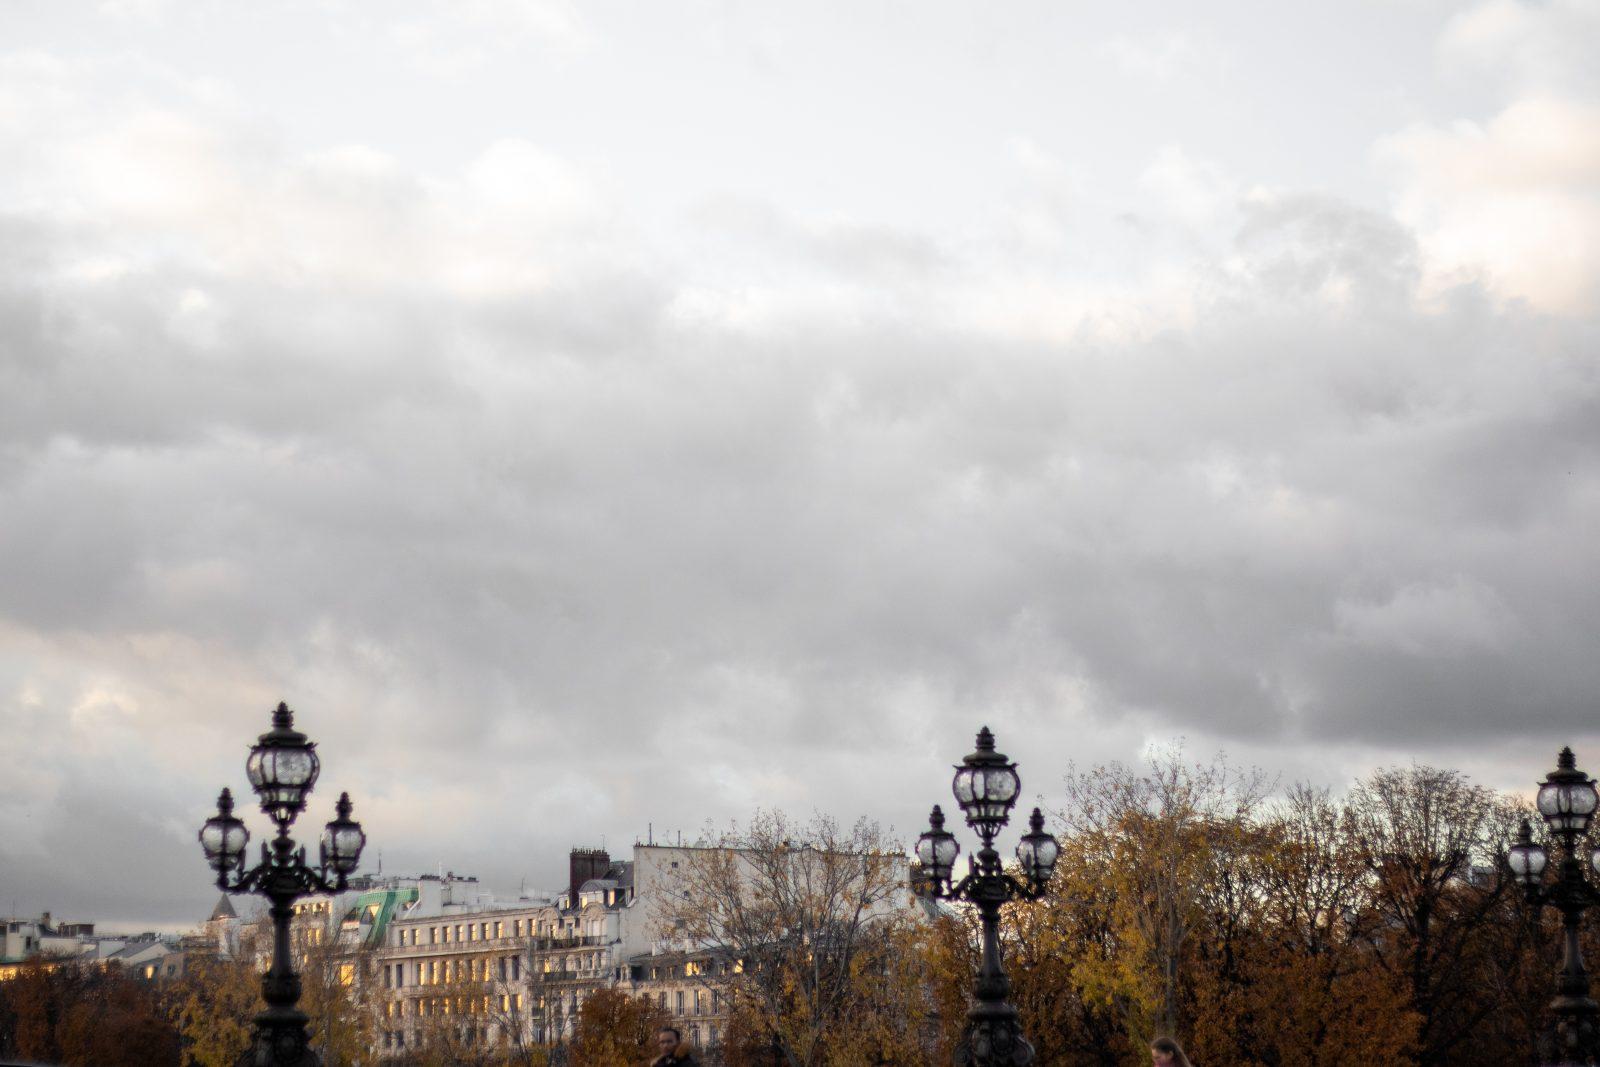 Sen efterår i Paris